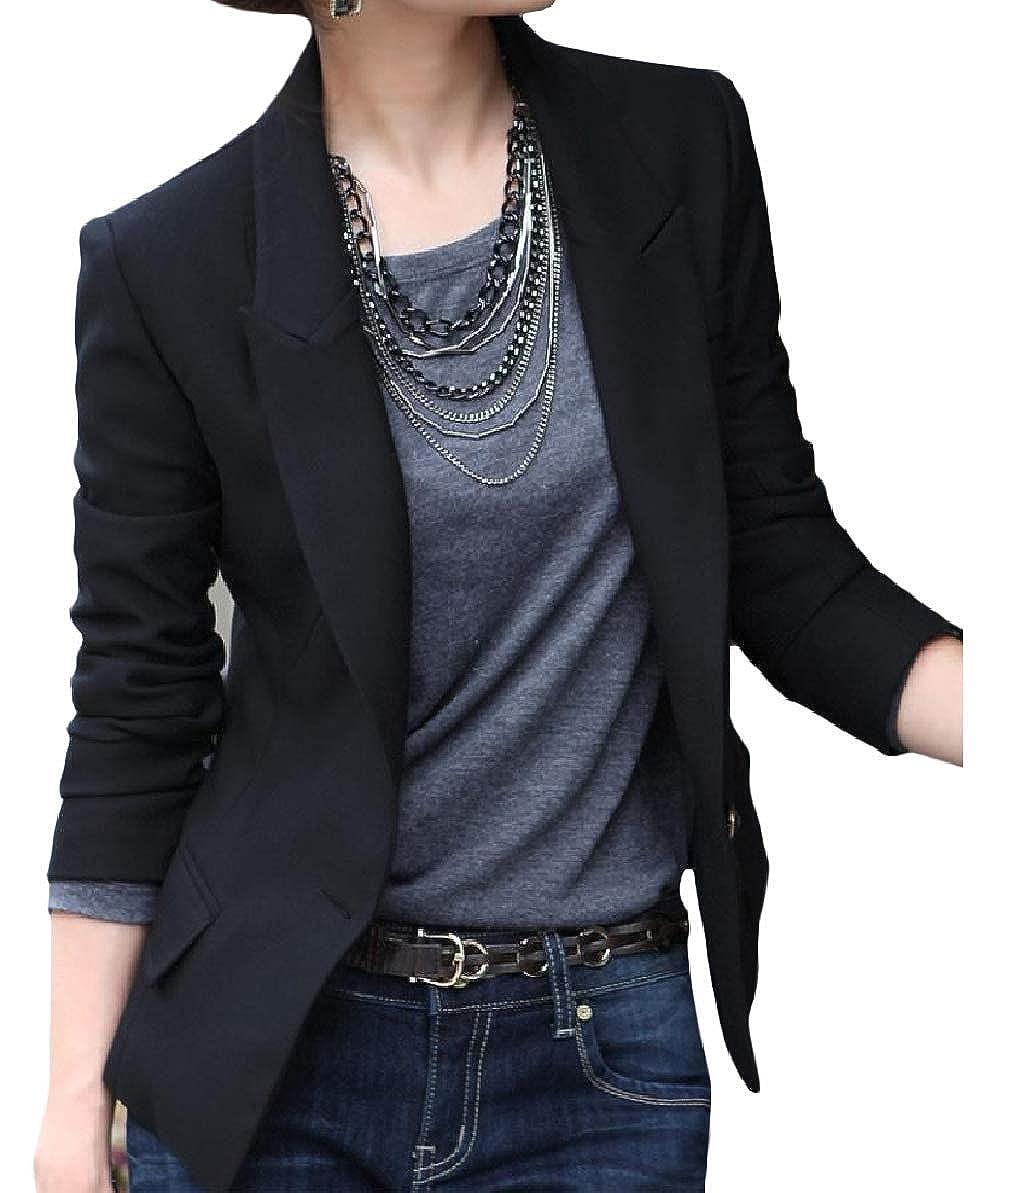 Zimaes-Women Lapel Long-Sleeve Mid-Long Oversized Pocketed Outwear Jacket